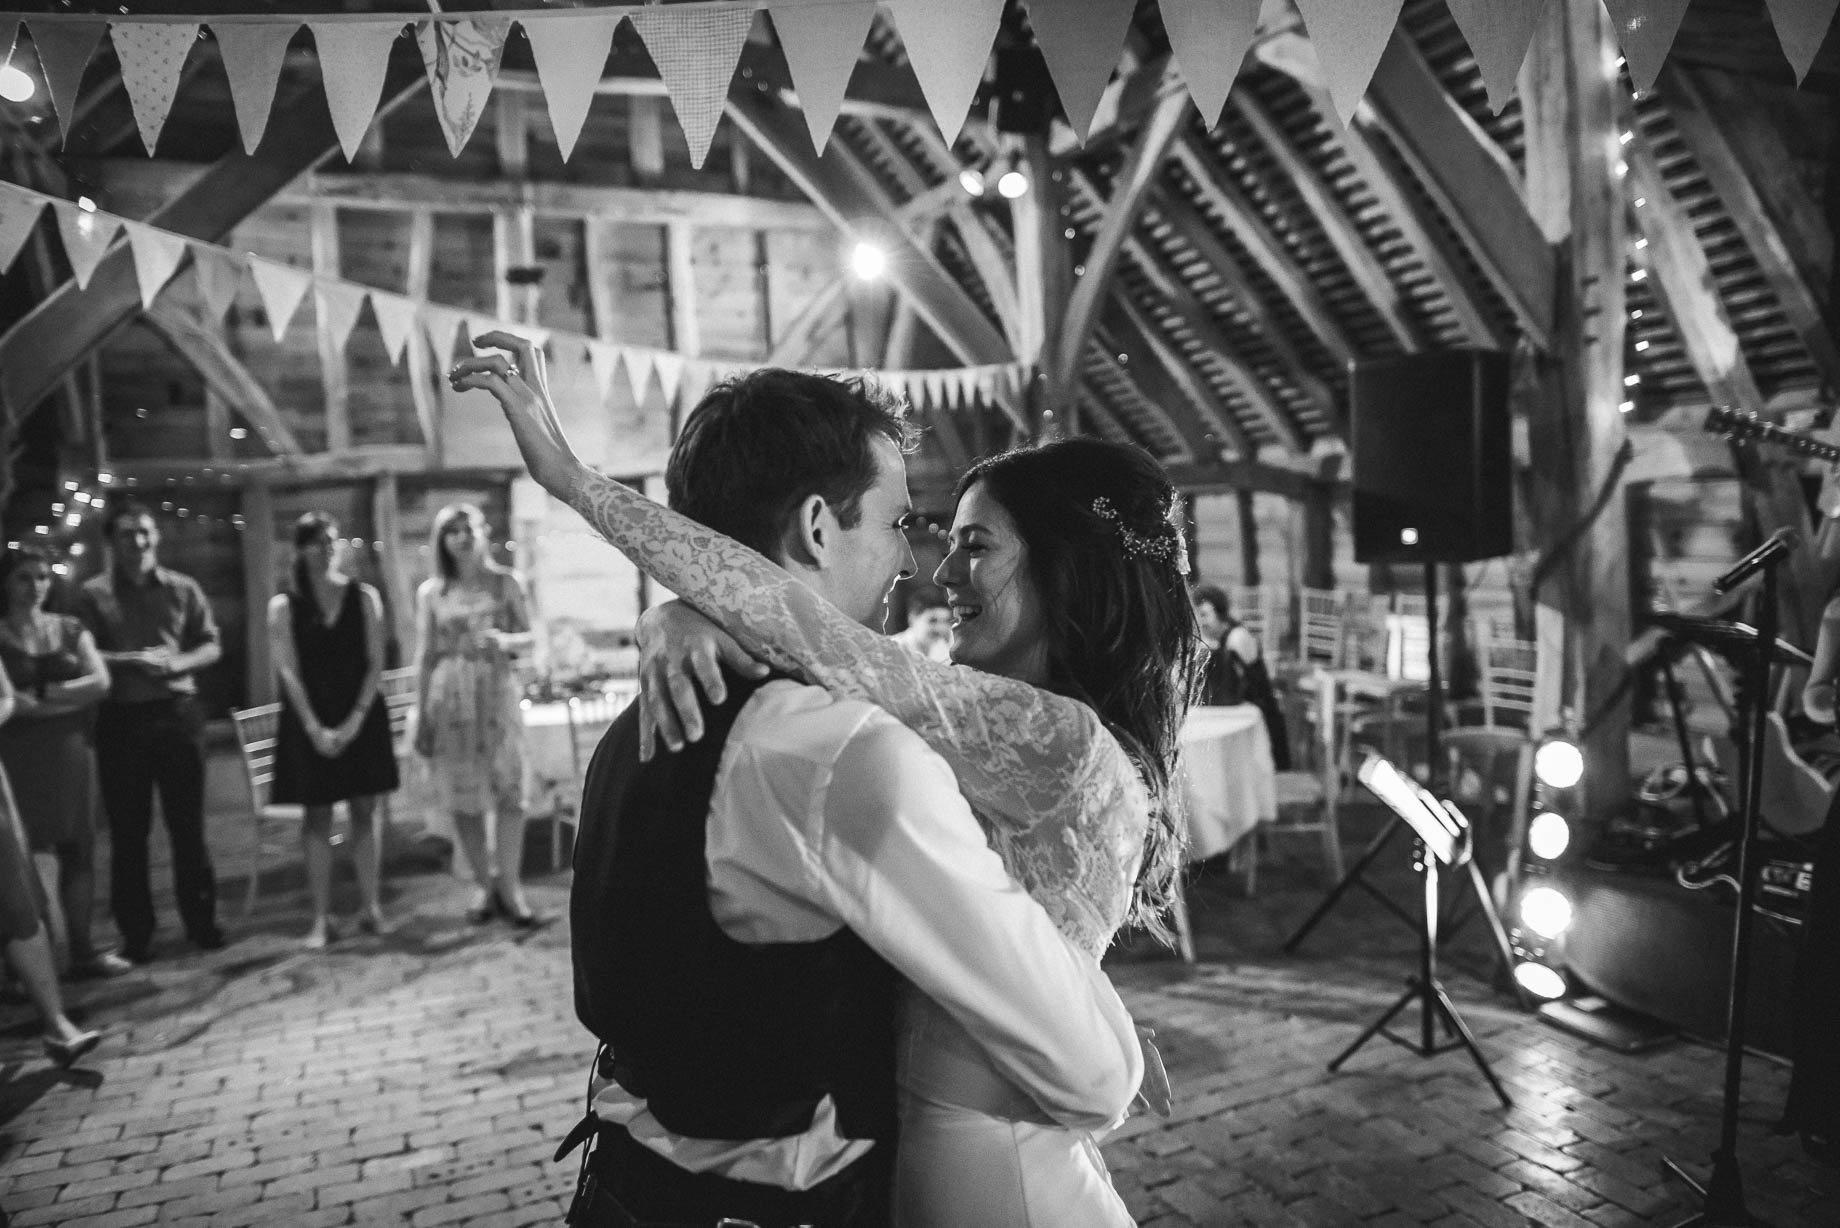 Gildings Barn wedding photography - Sarah and Steve (178 of 190)